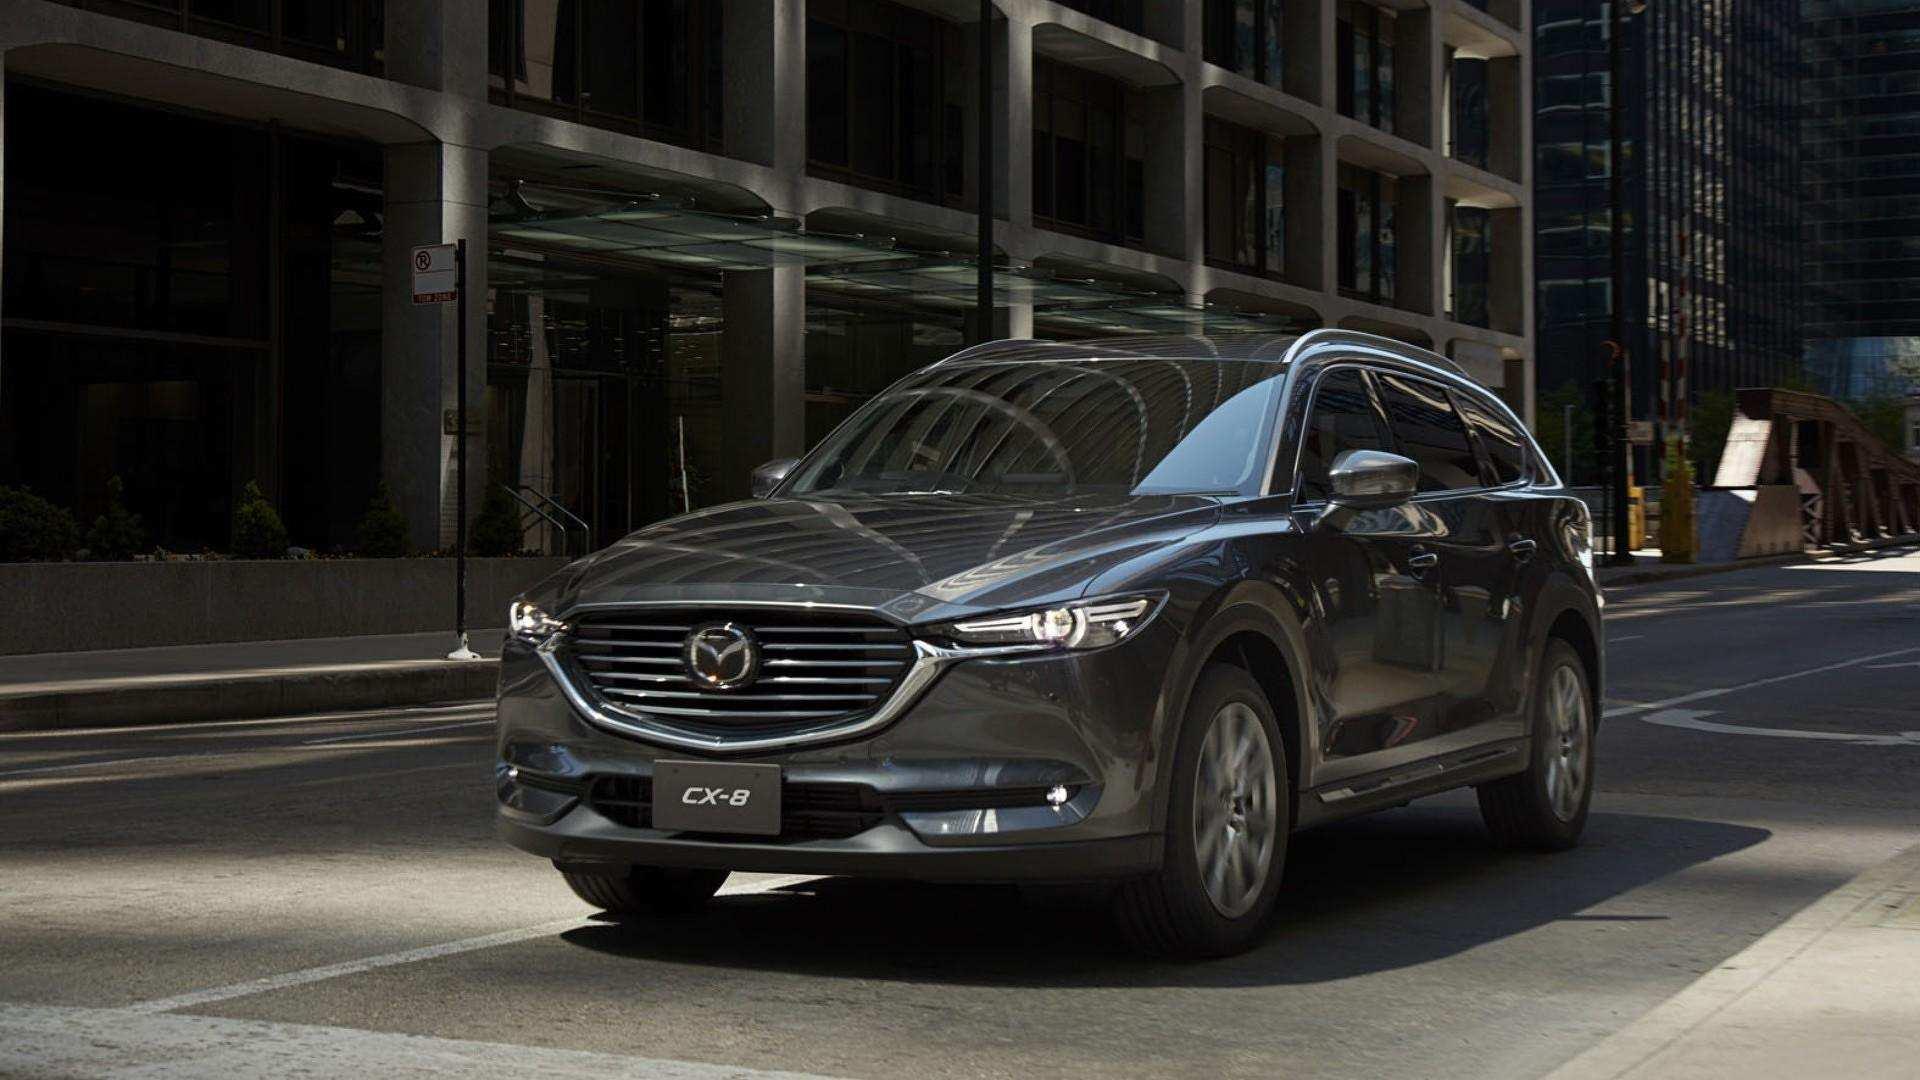 60 Best Review Mazda Bakkie 2020 Review by Mazda Bakkie 2020